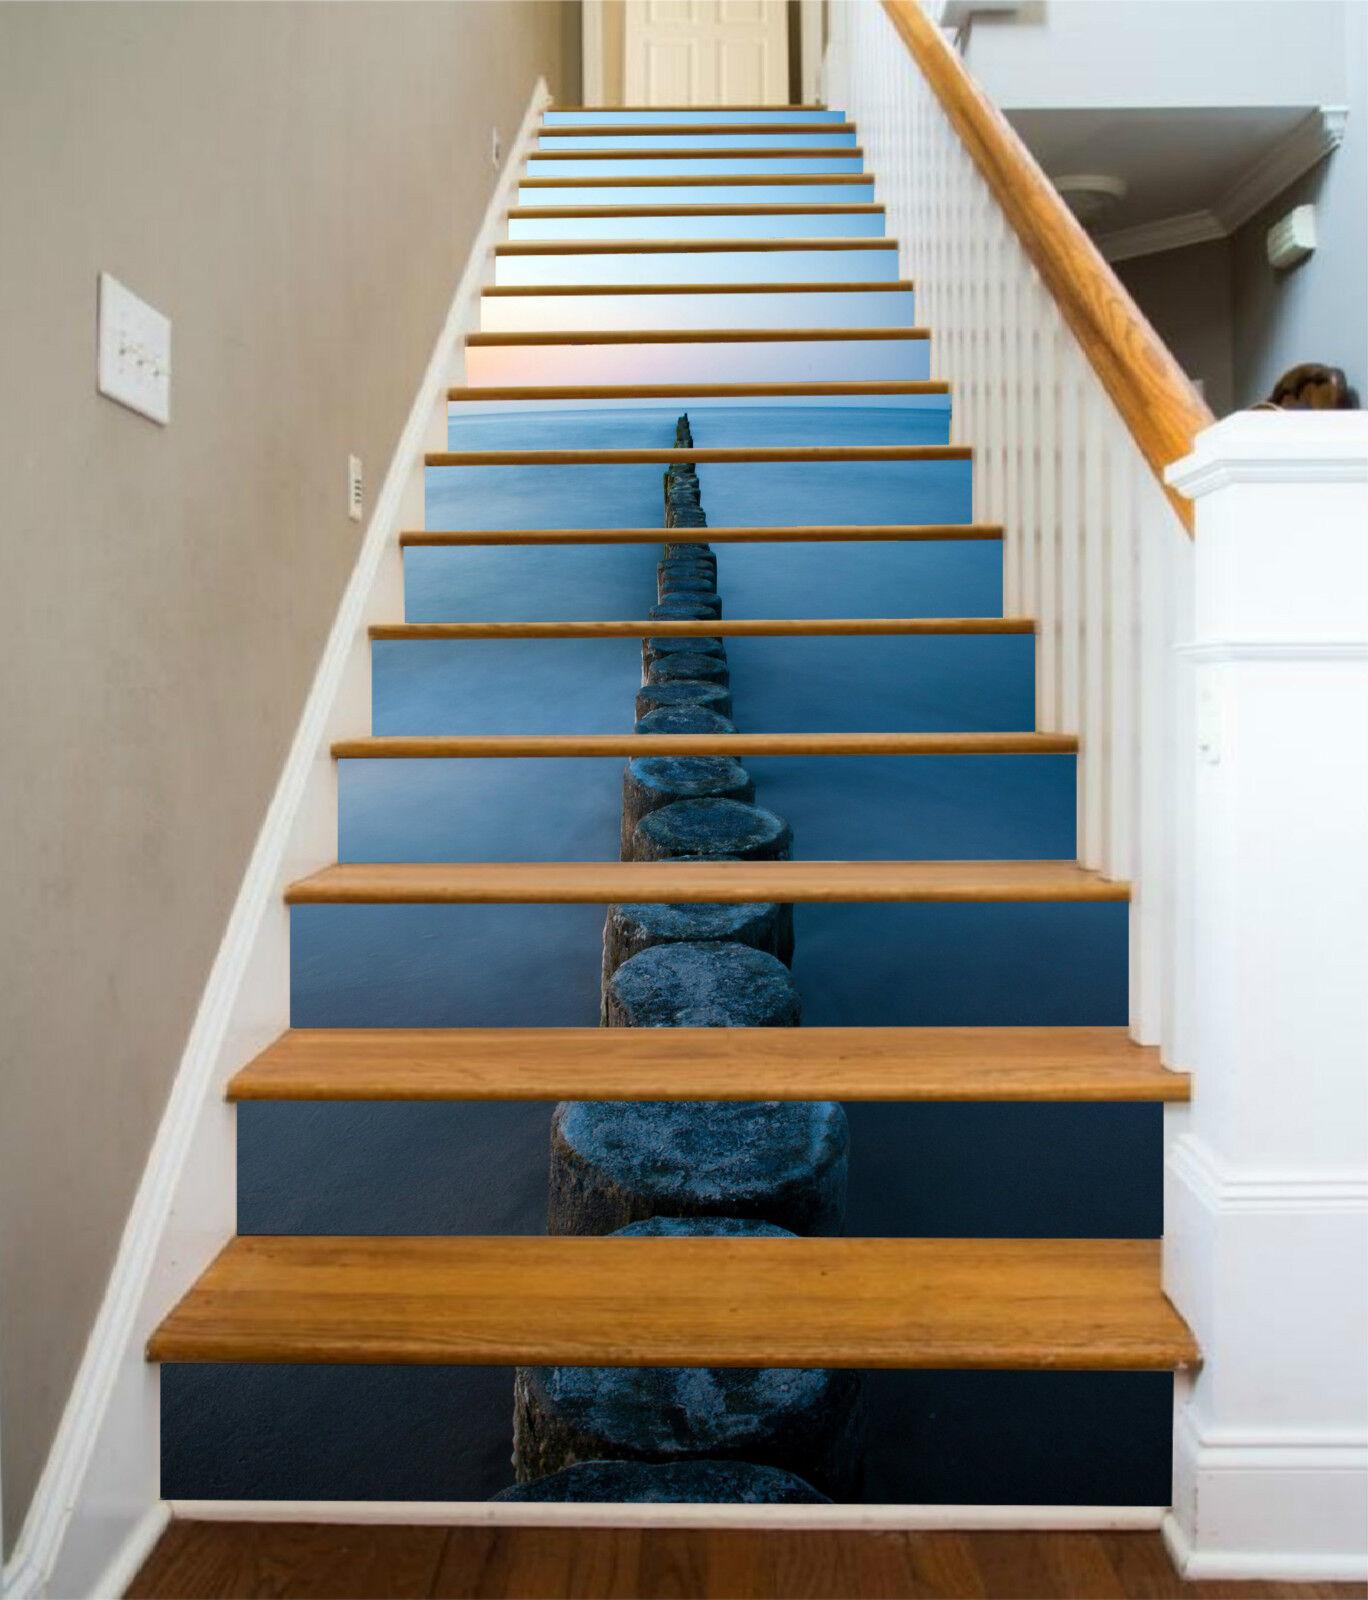 3D Boundless Meer 2 Stair Risers Dekoration Fototapete Vinyl Aufkleber Tapete DE